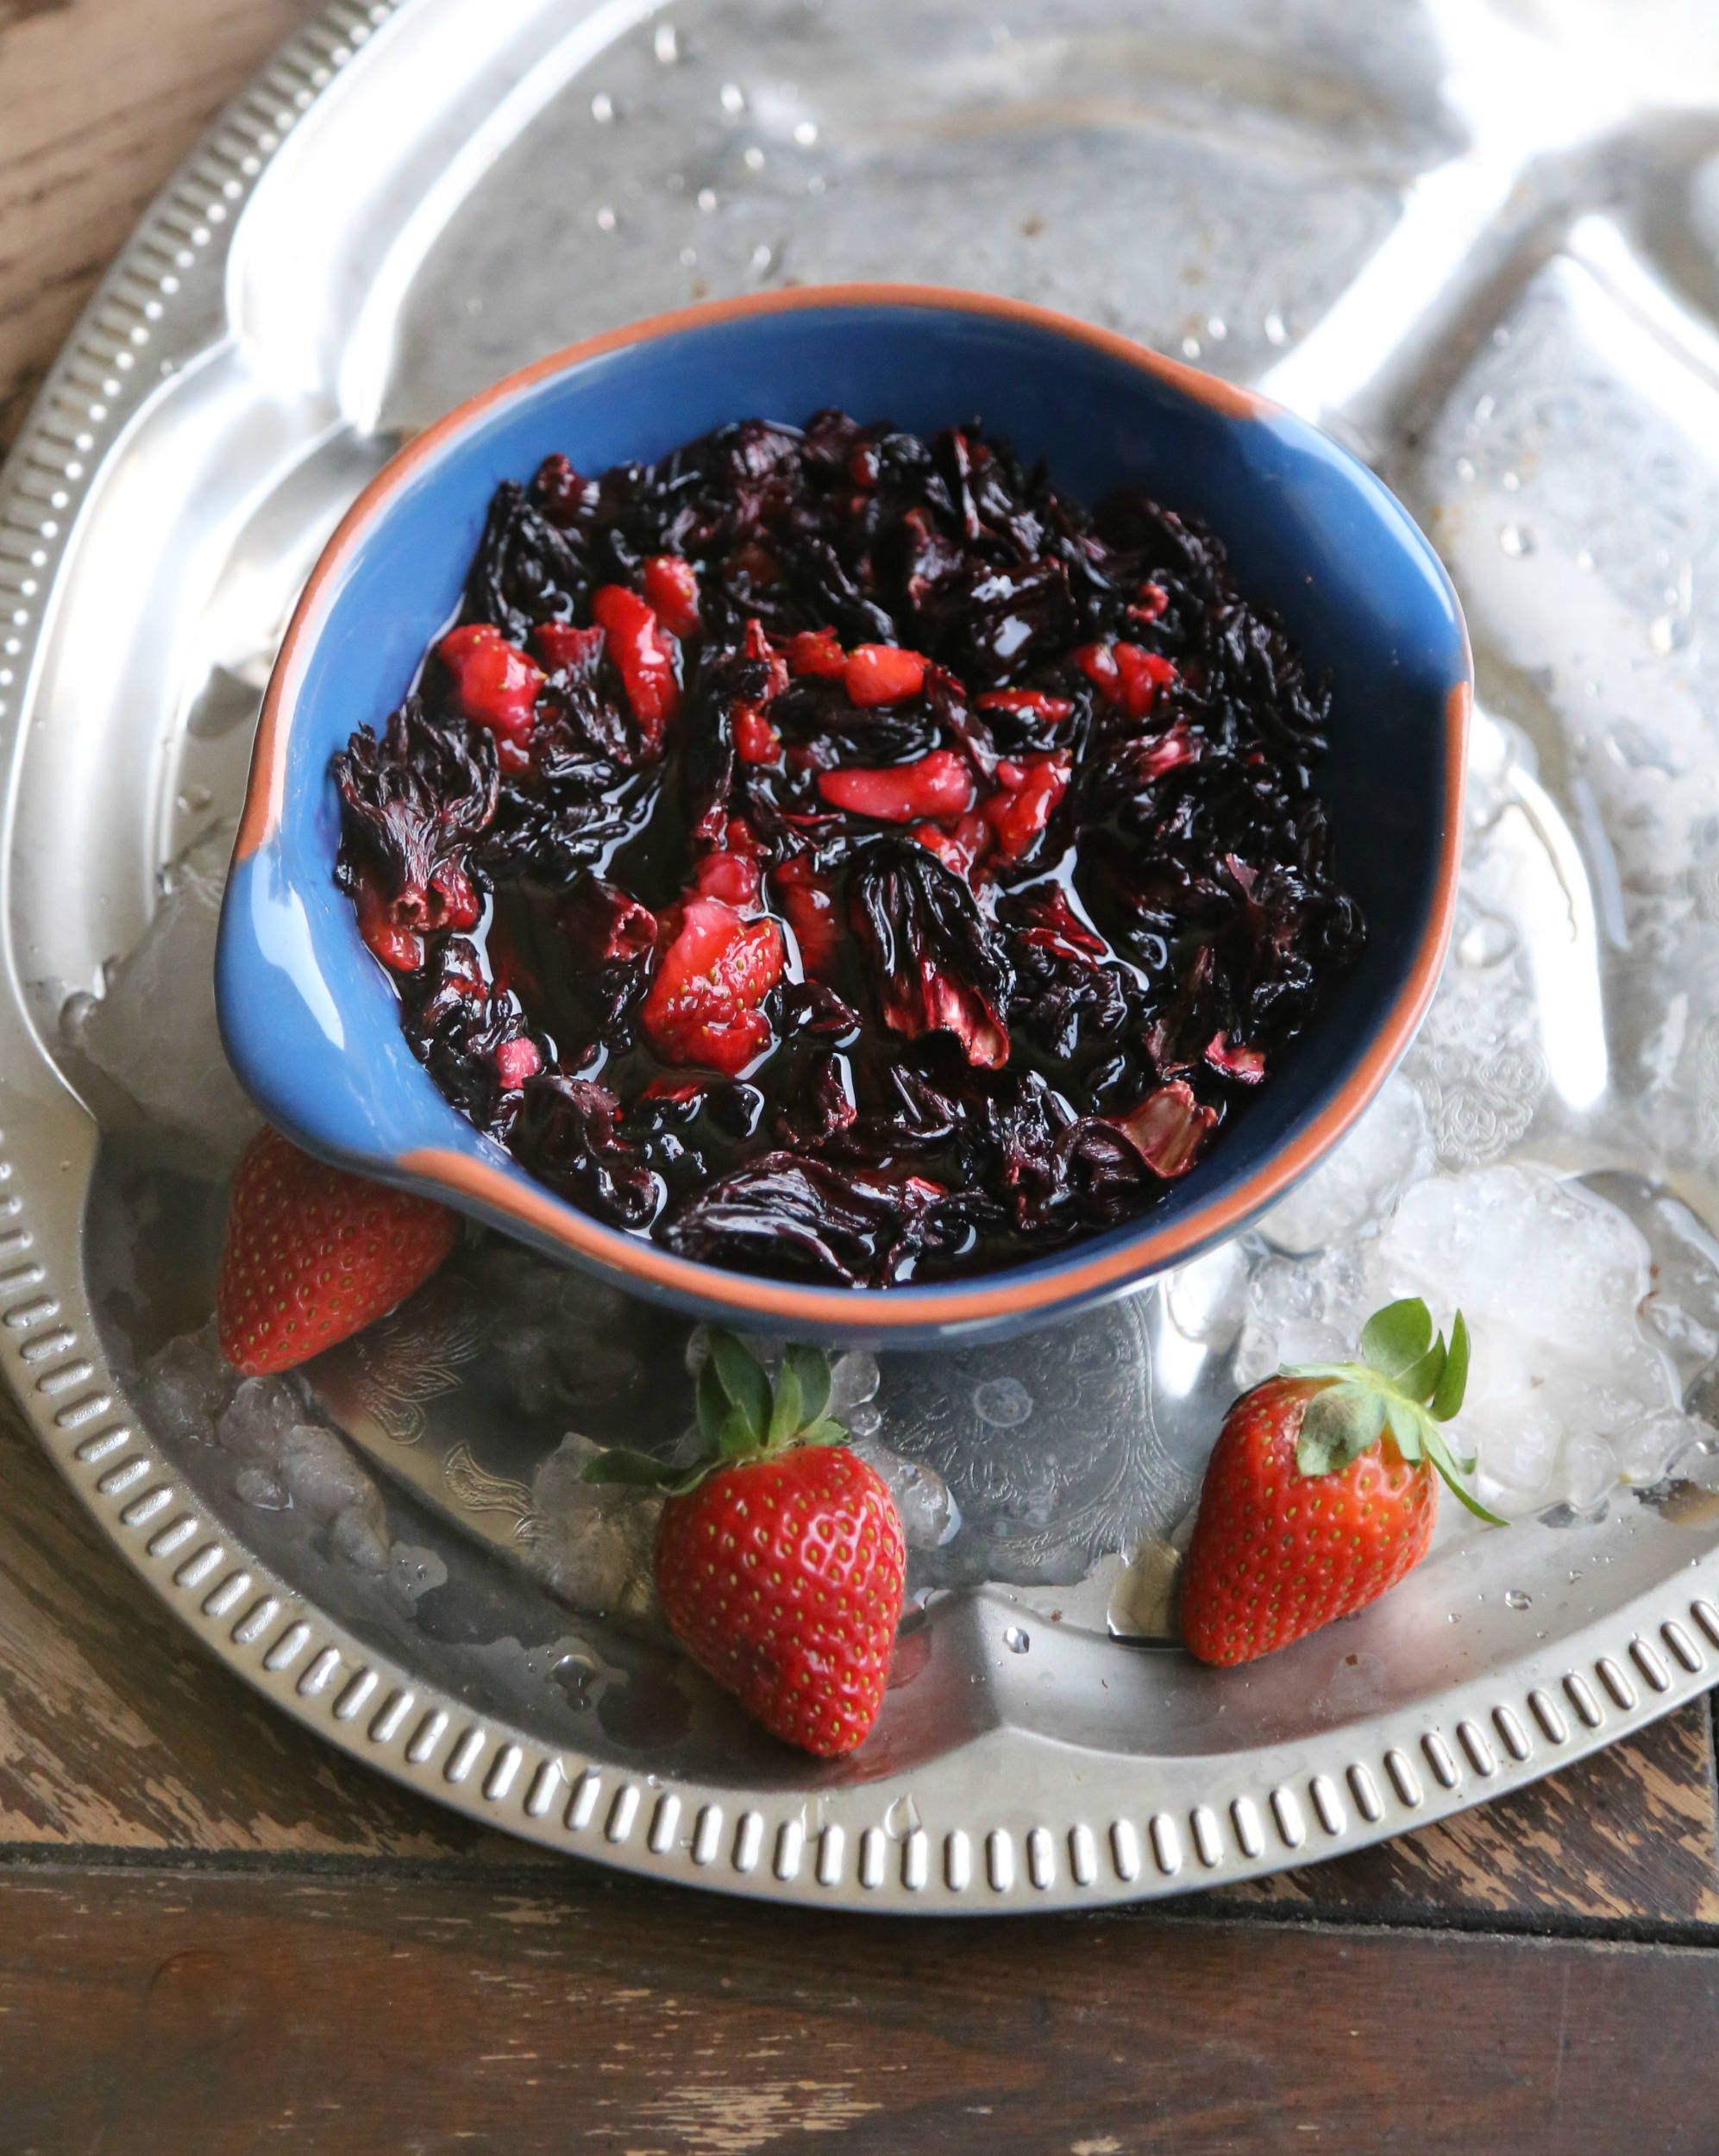 hibiscus-strawberry-syrup-cocktail-vianneyrodriguez-sweetlifebake